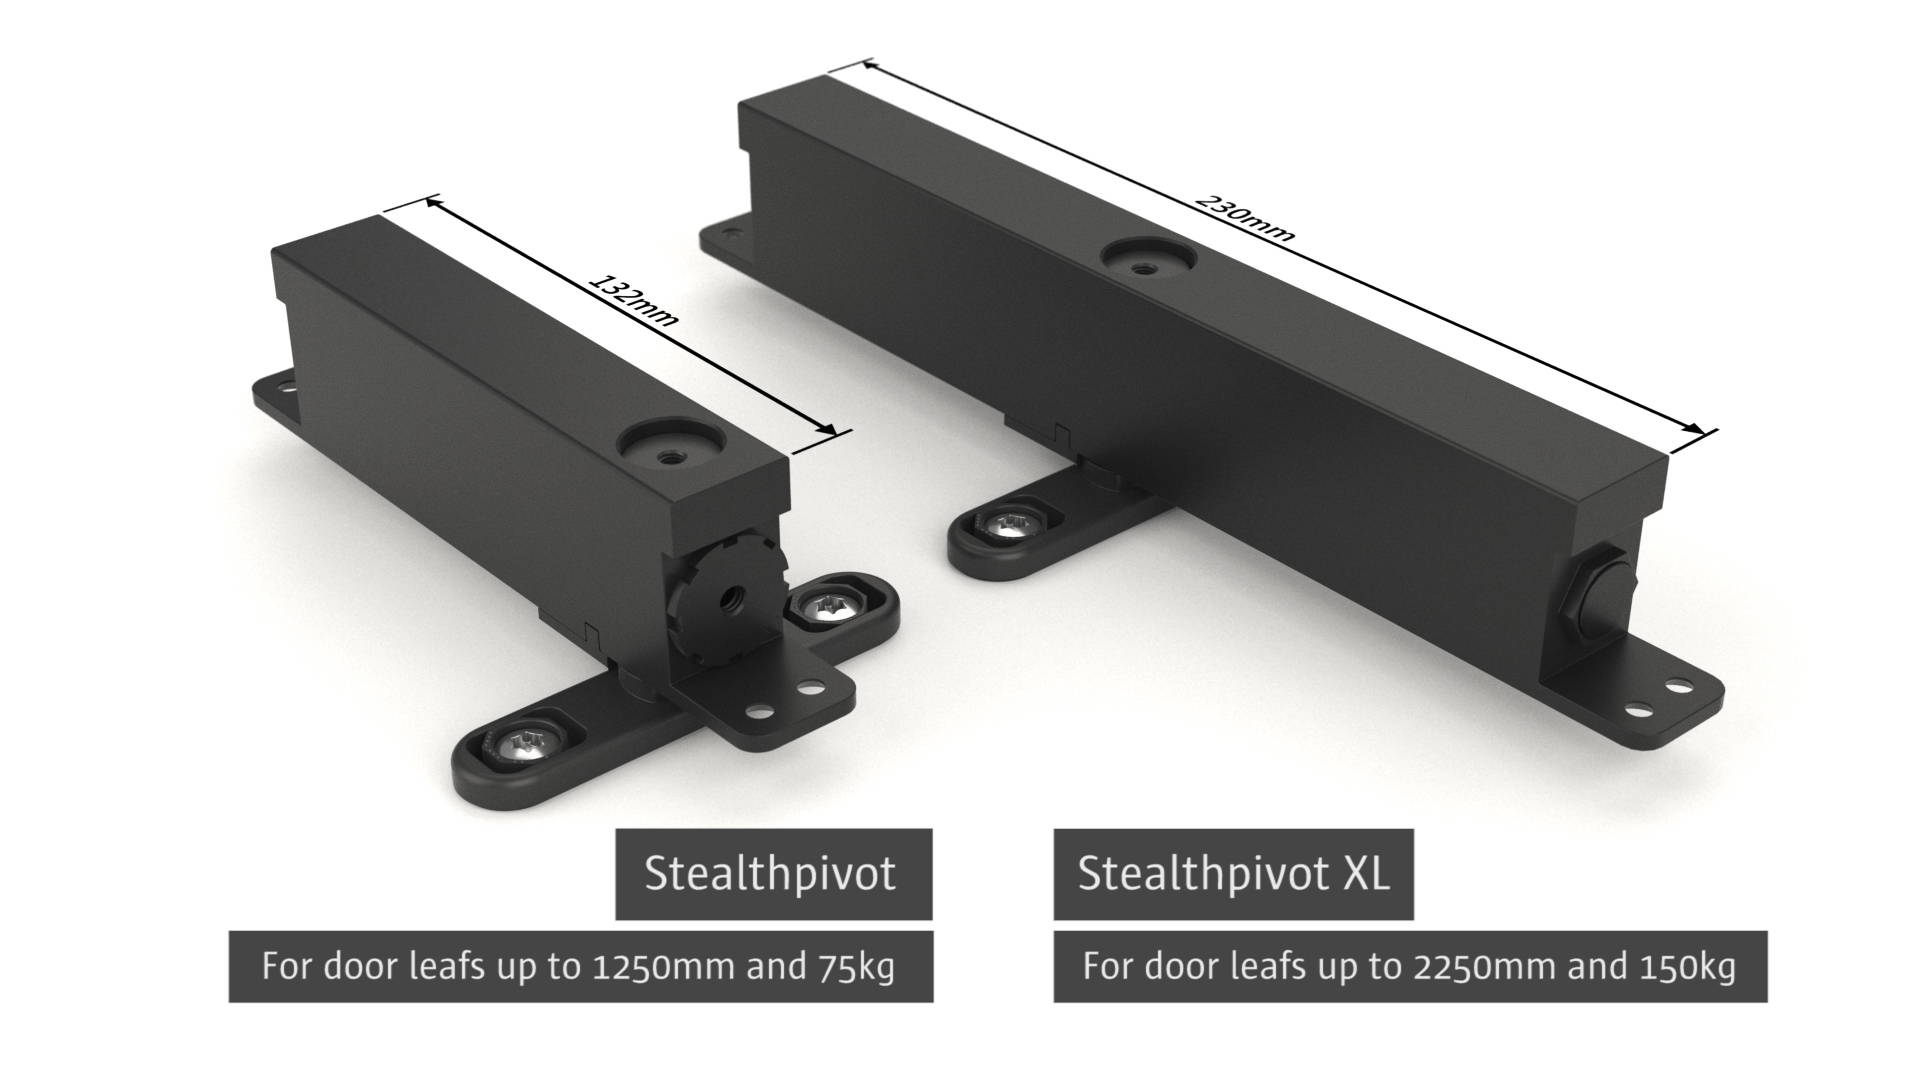 compact self-closing pivot hinges Stealth Pivot